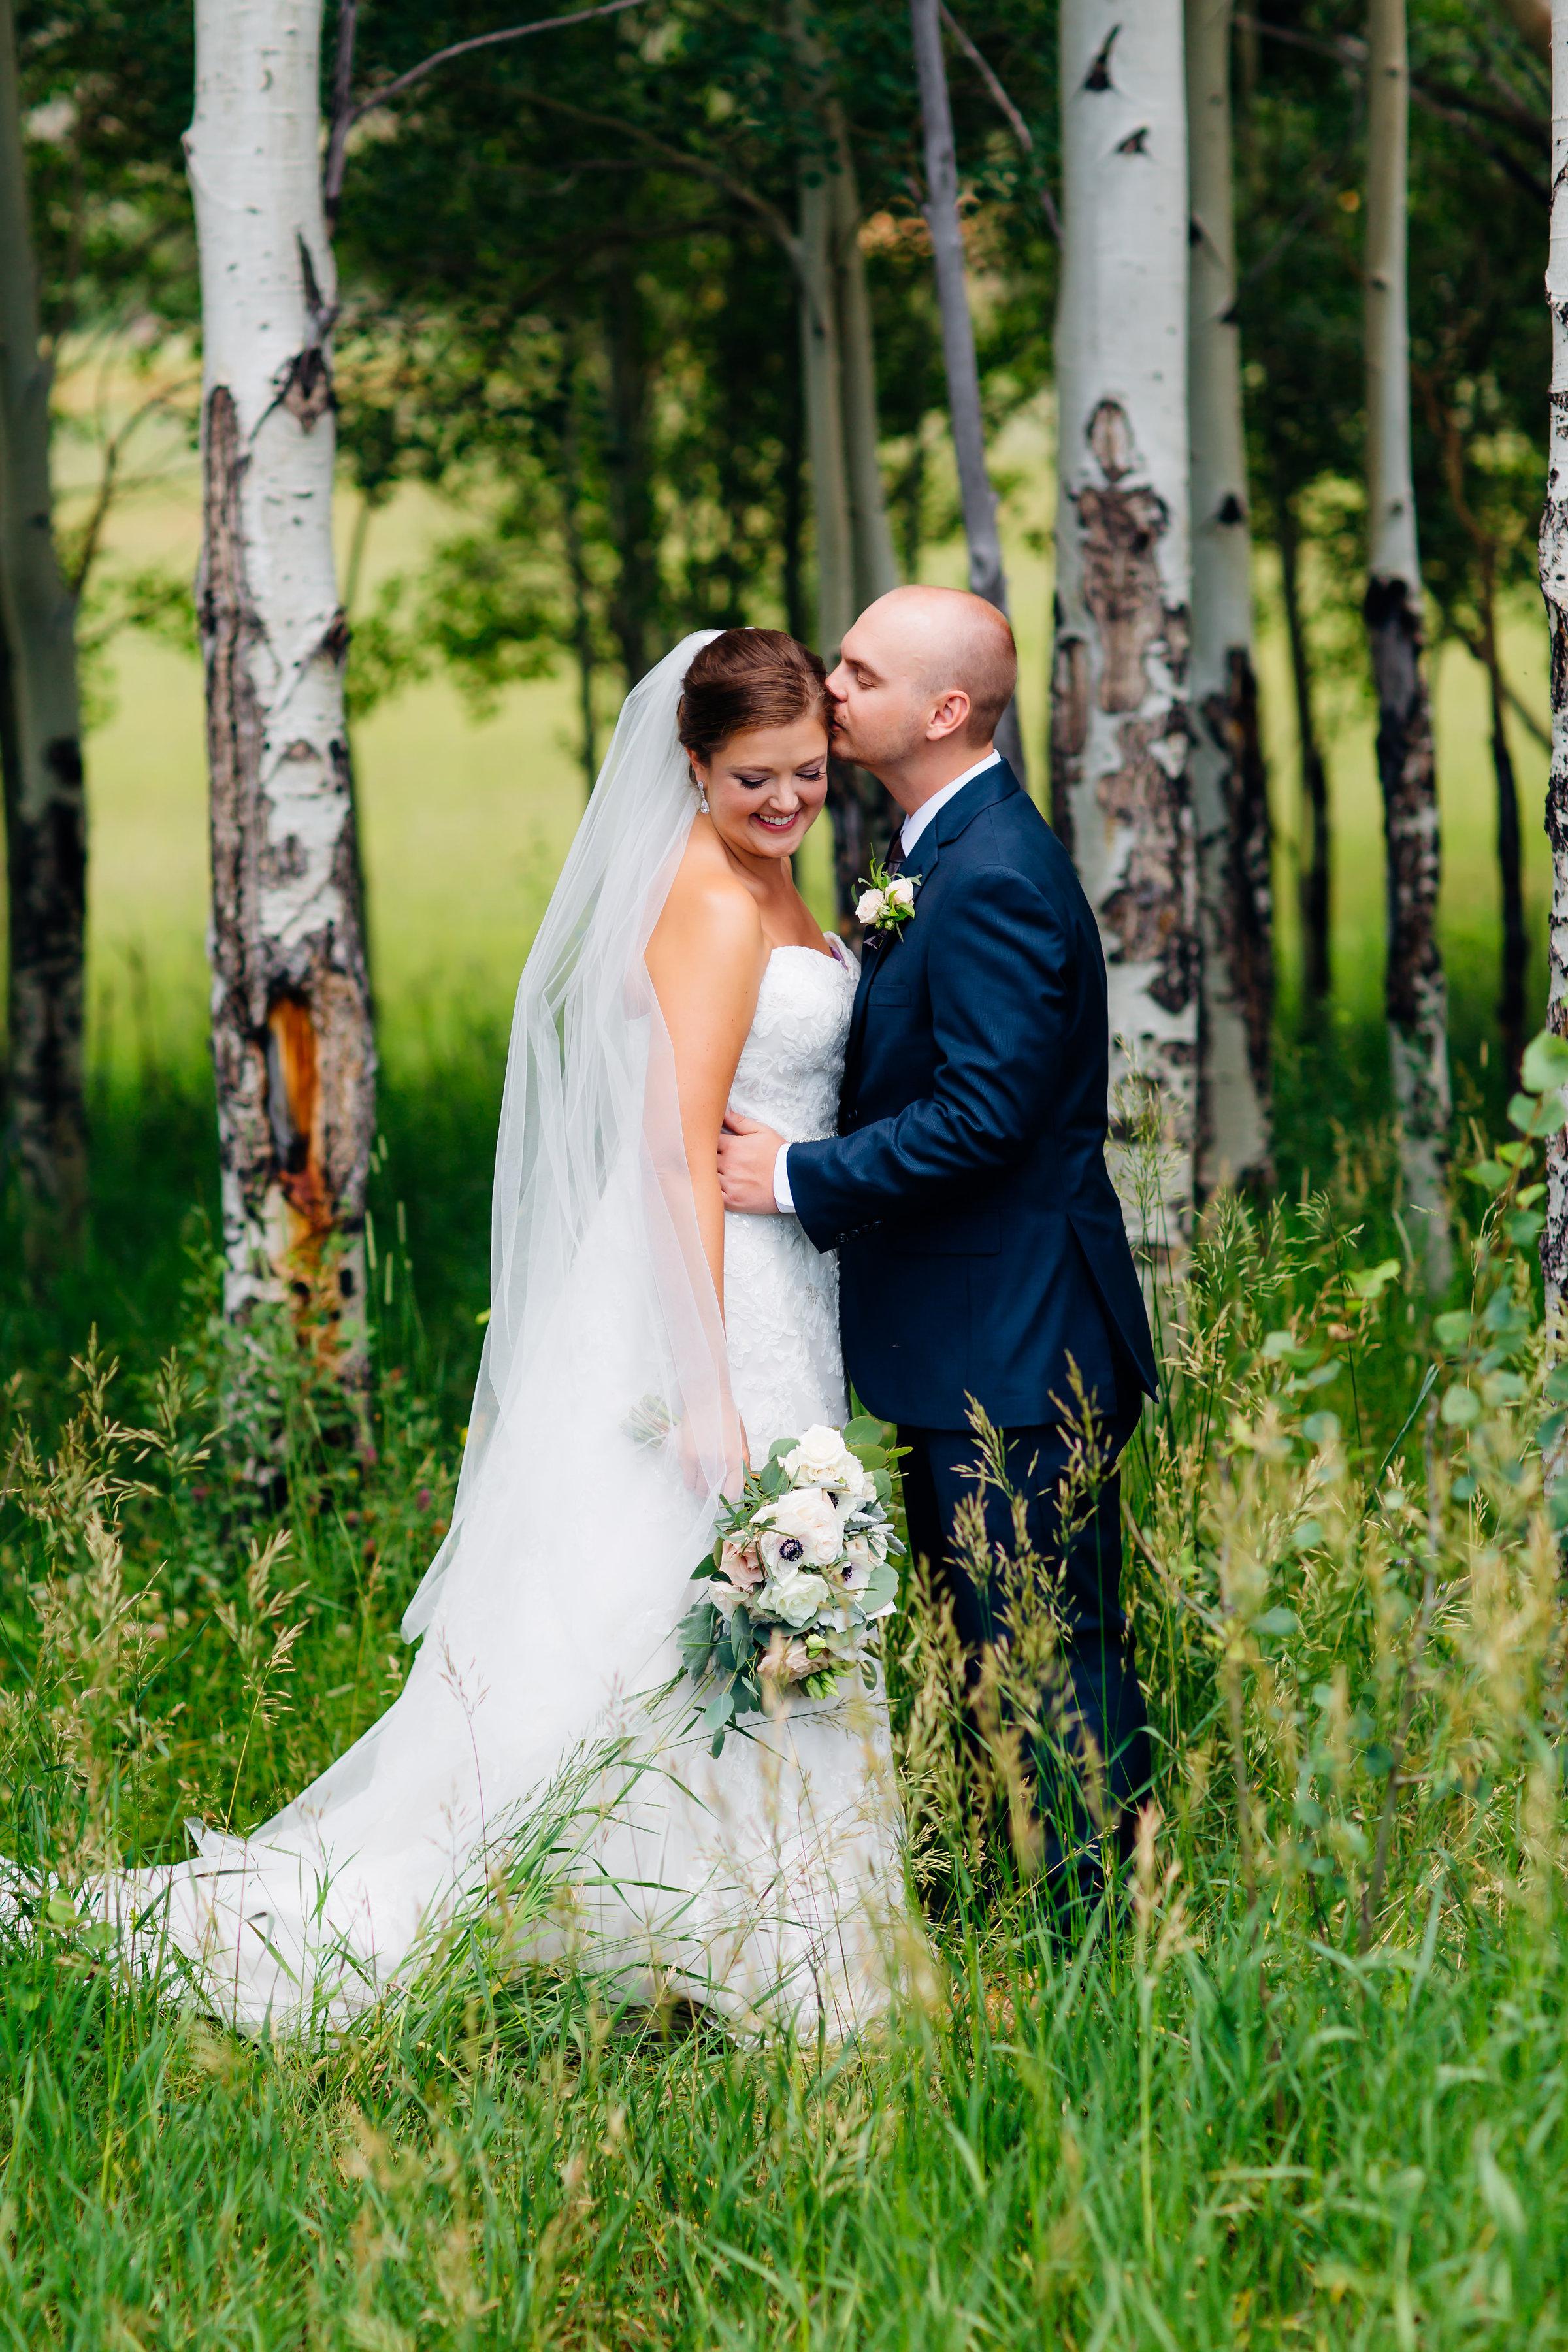 kaitlin_kurt_bridegroomportraits-18